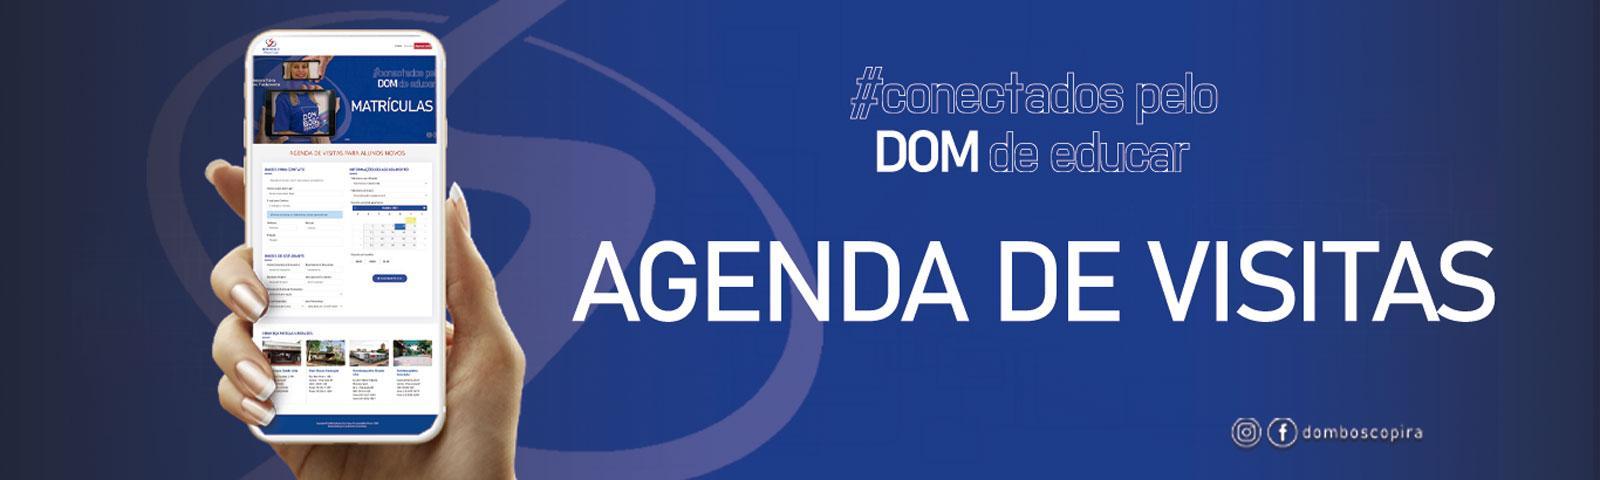 images/2020/10/120-fullhd-agenda-de-visitas.jpg